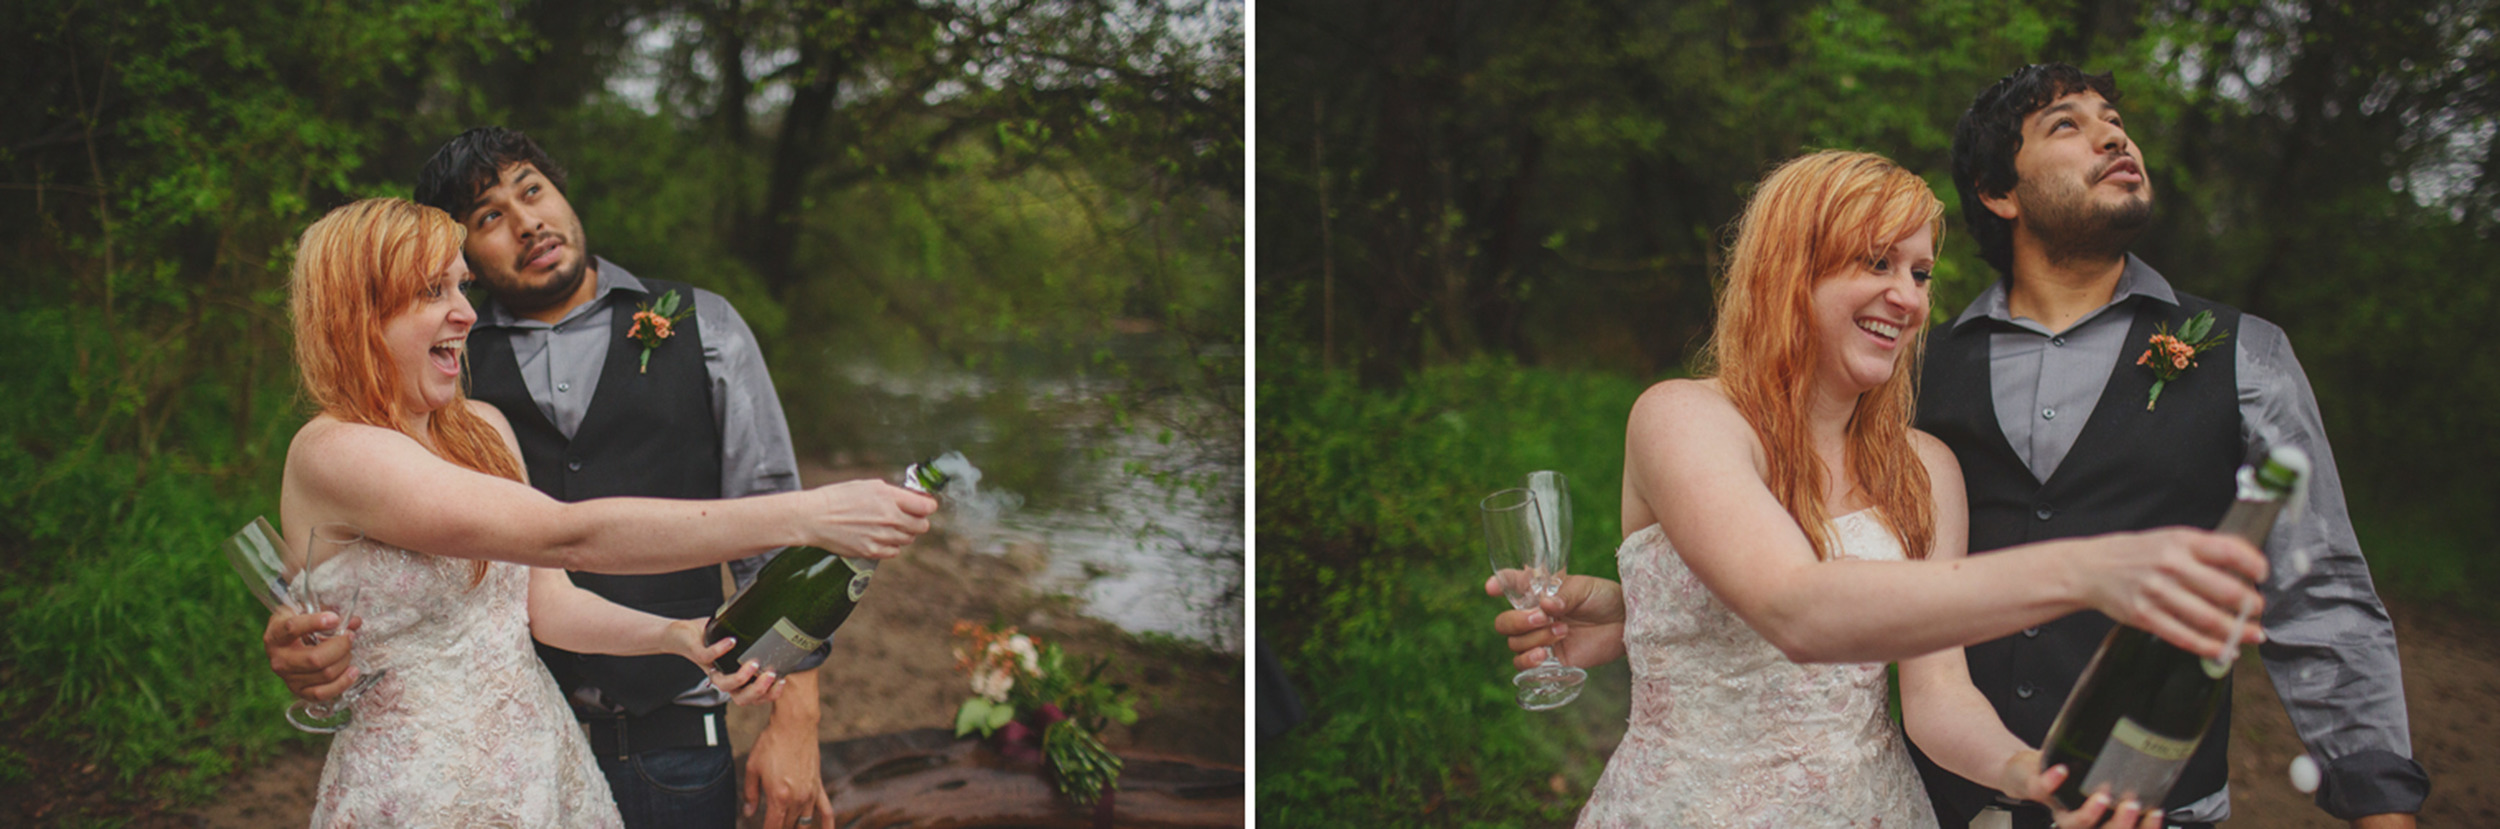 PhotobyBetsy-elopement029.jpg